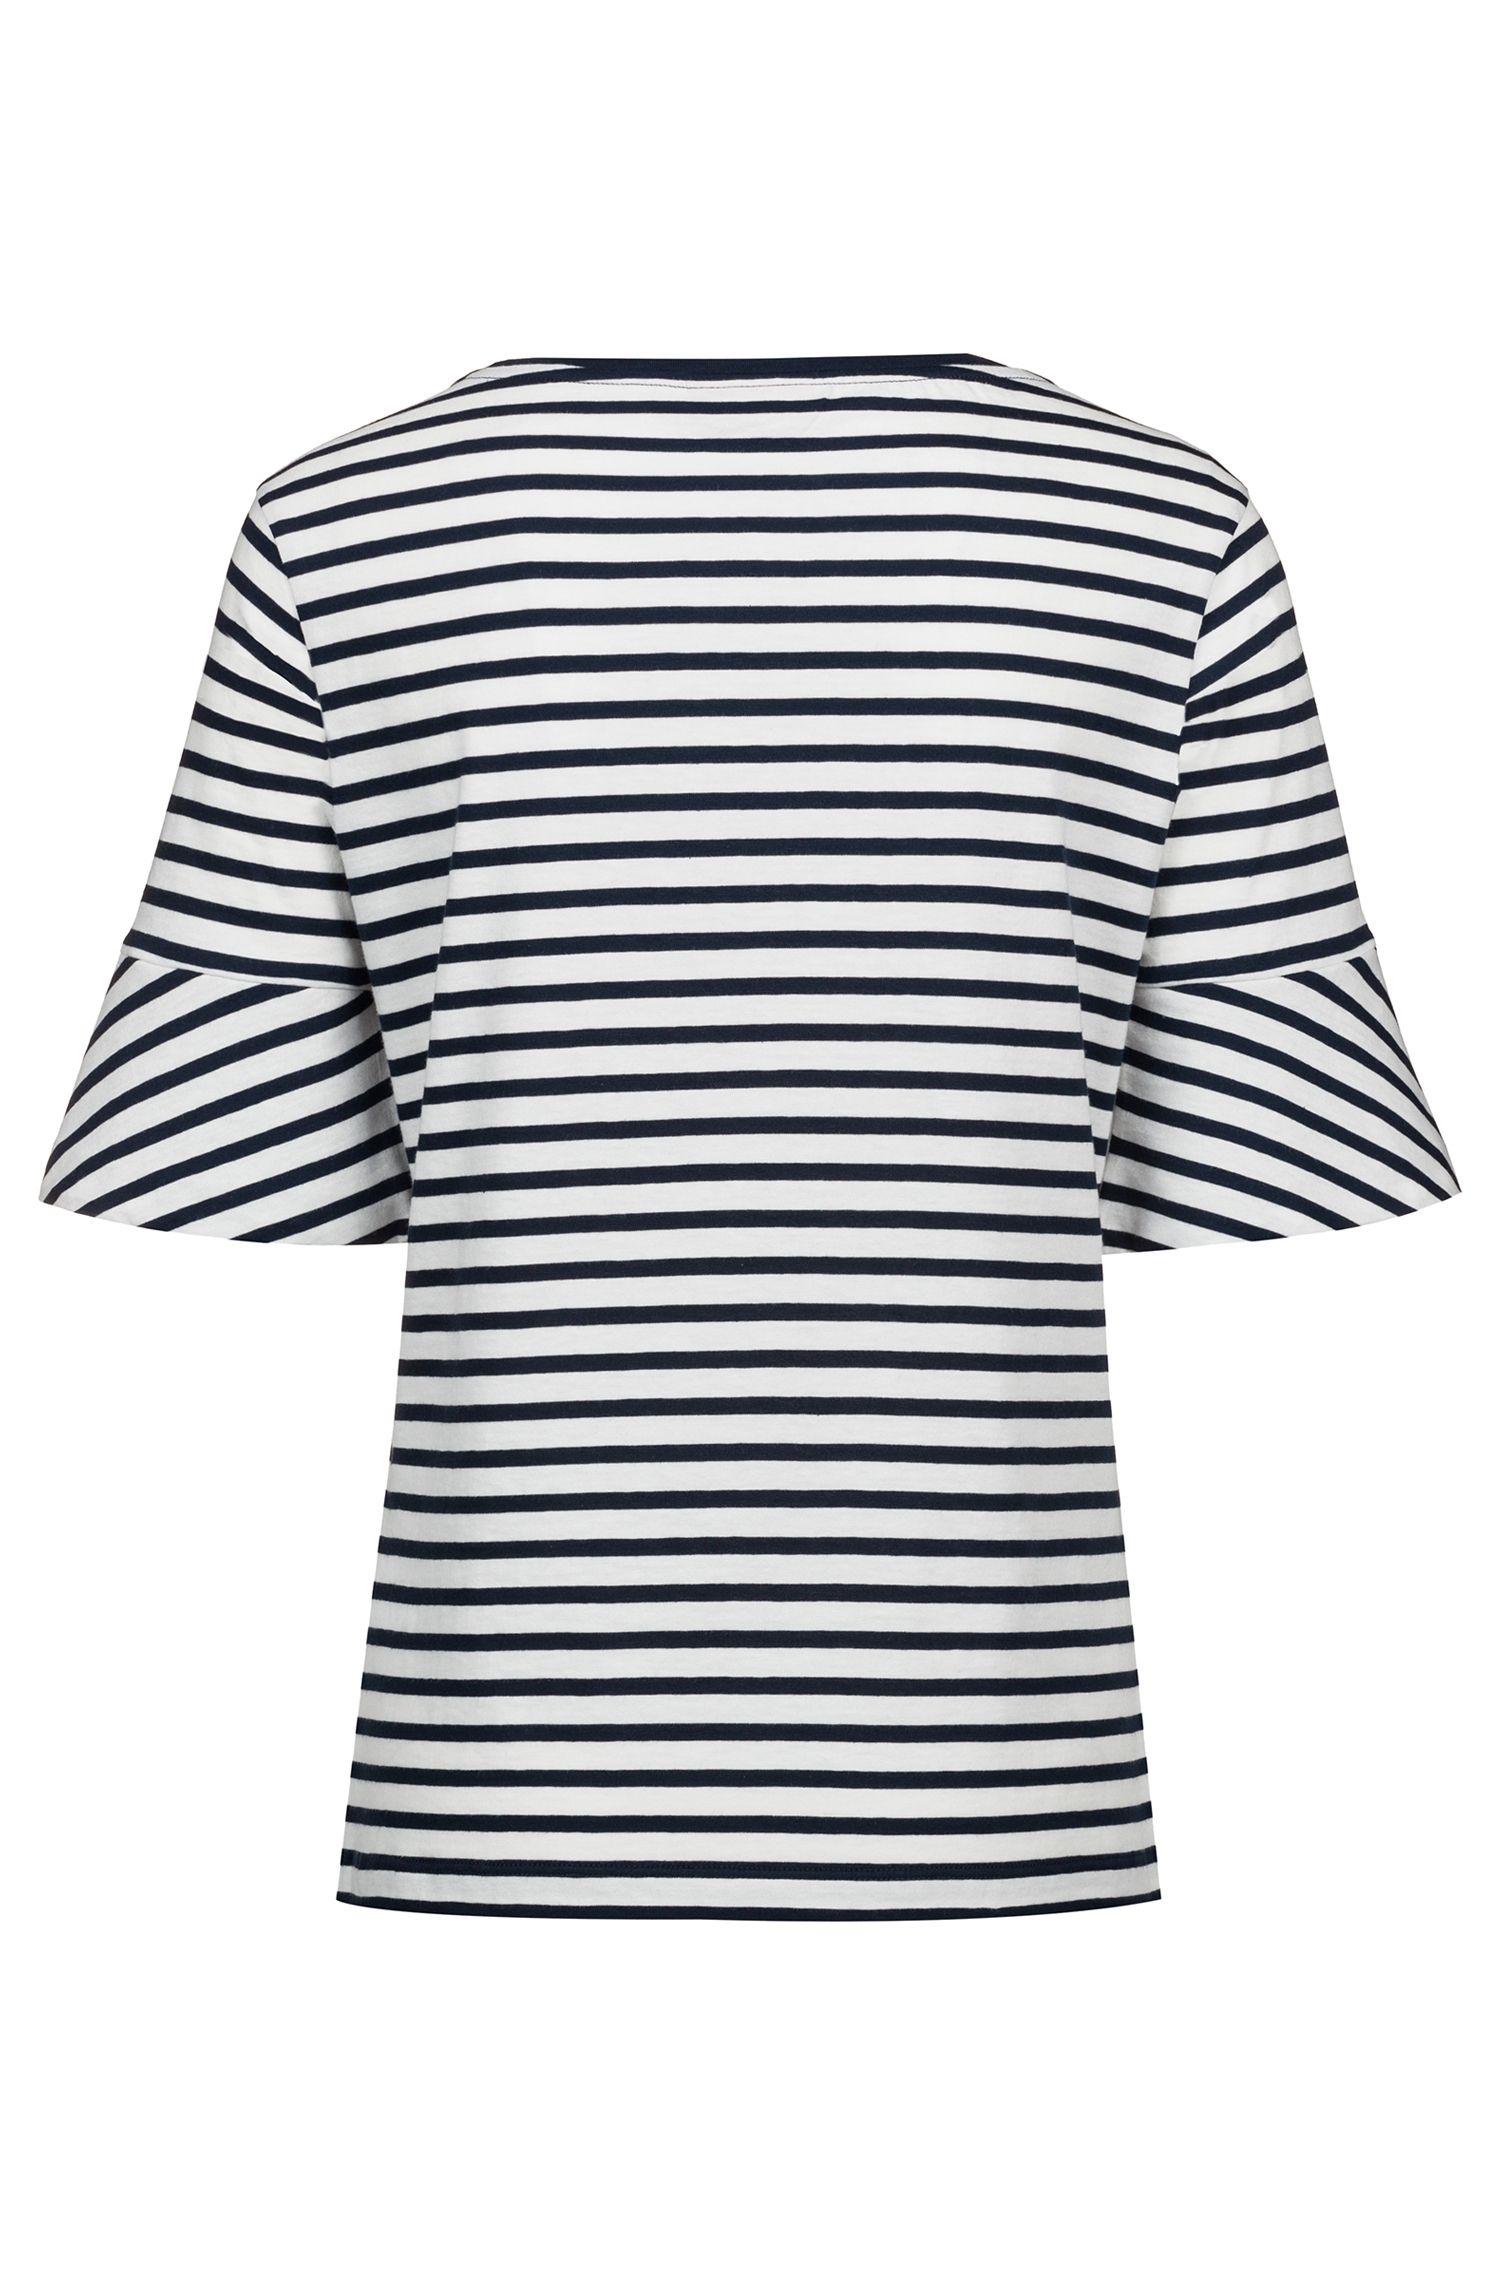 Trumpet-sleeve T-shirt in cotton with woven stripe, Dark Blue